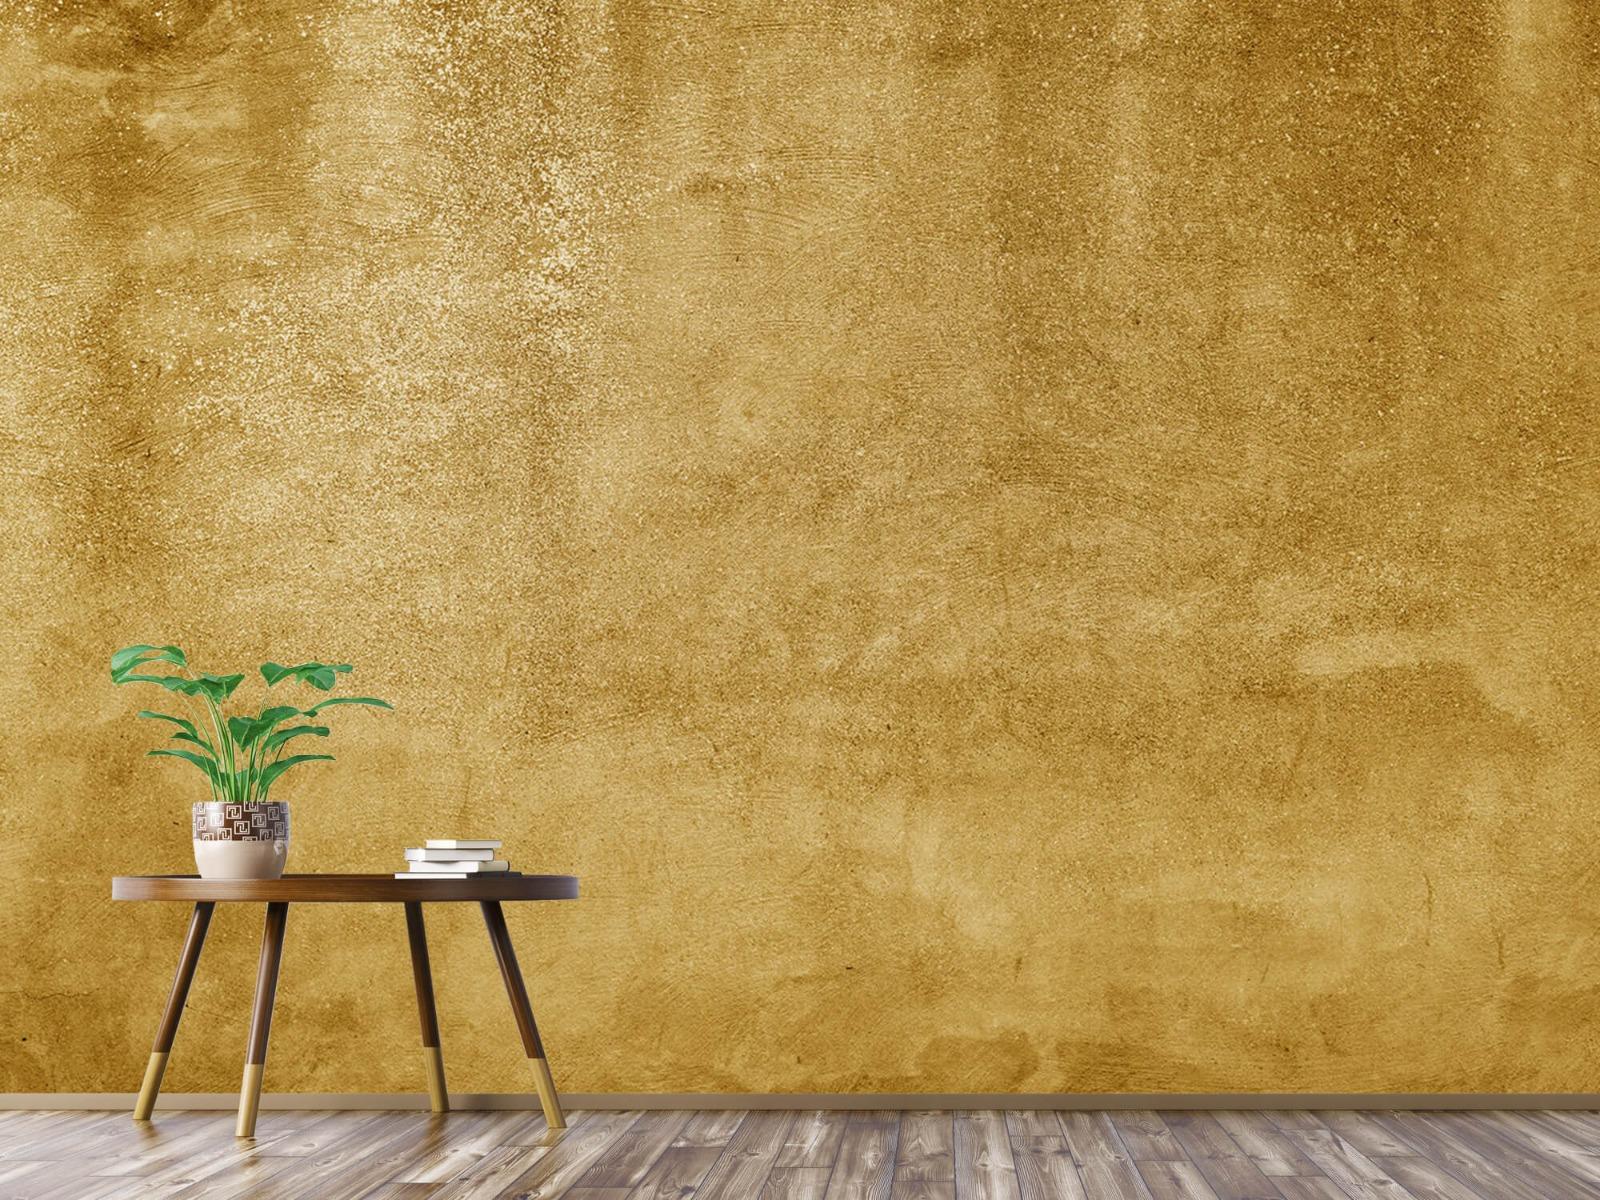 Betonlook behang - Oker geel beton - Woonkamer 5